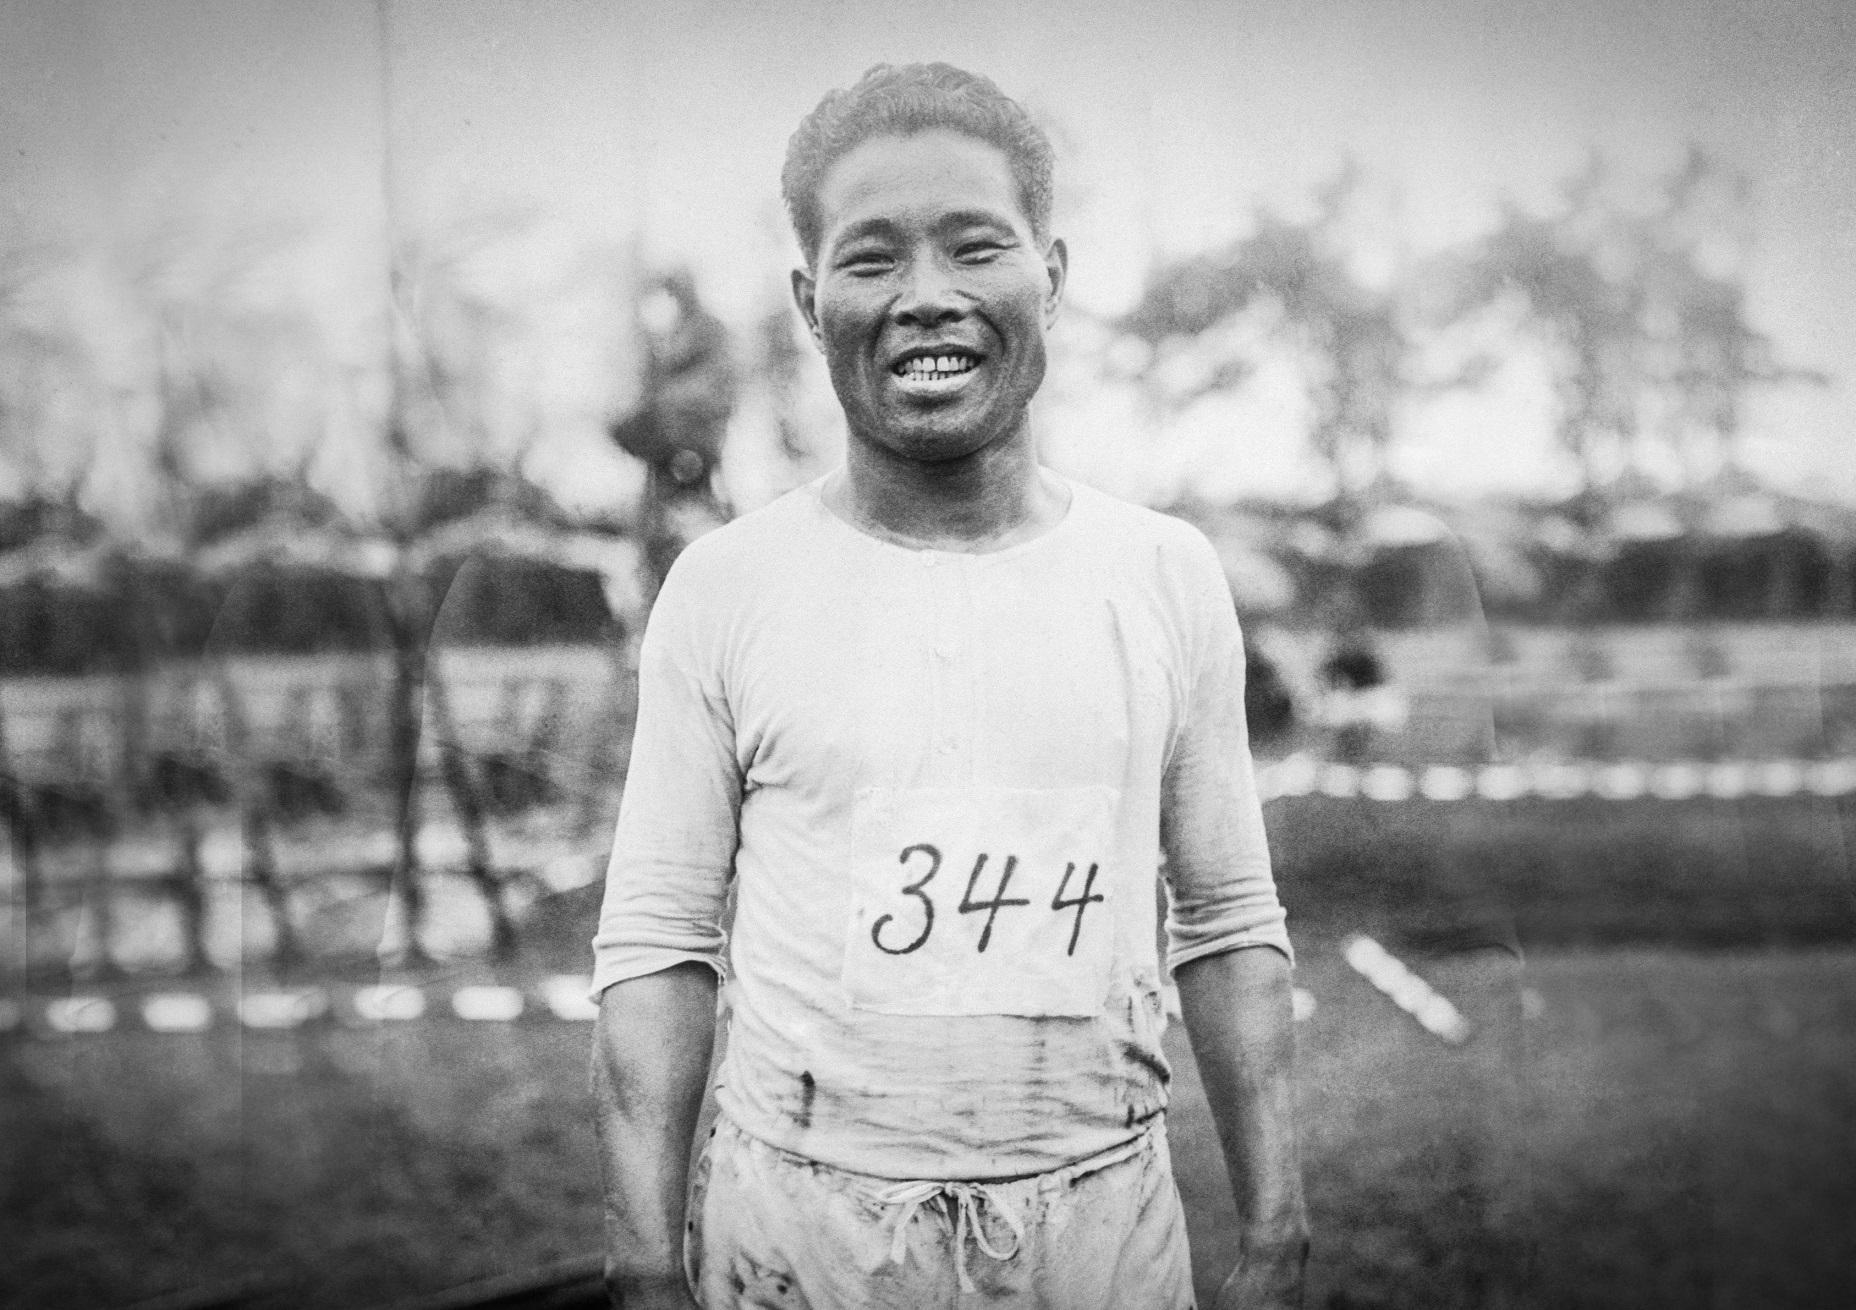 «Отец марафона». Японец Сидзо Канакури завершил марафон Олимпийских игр через 55 лет после старта